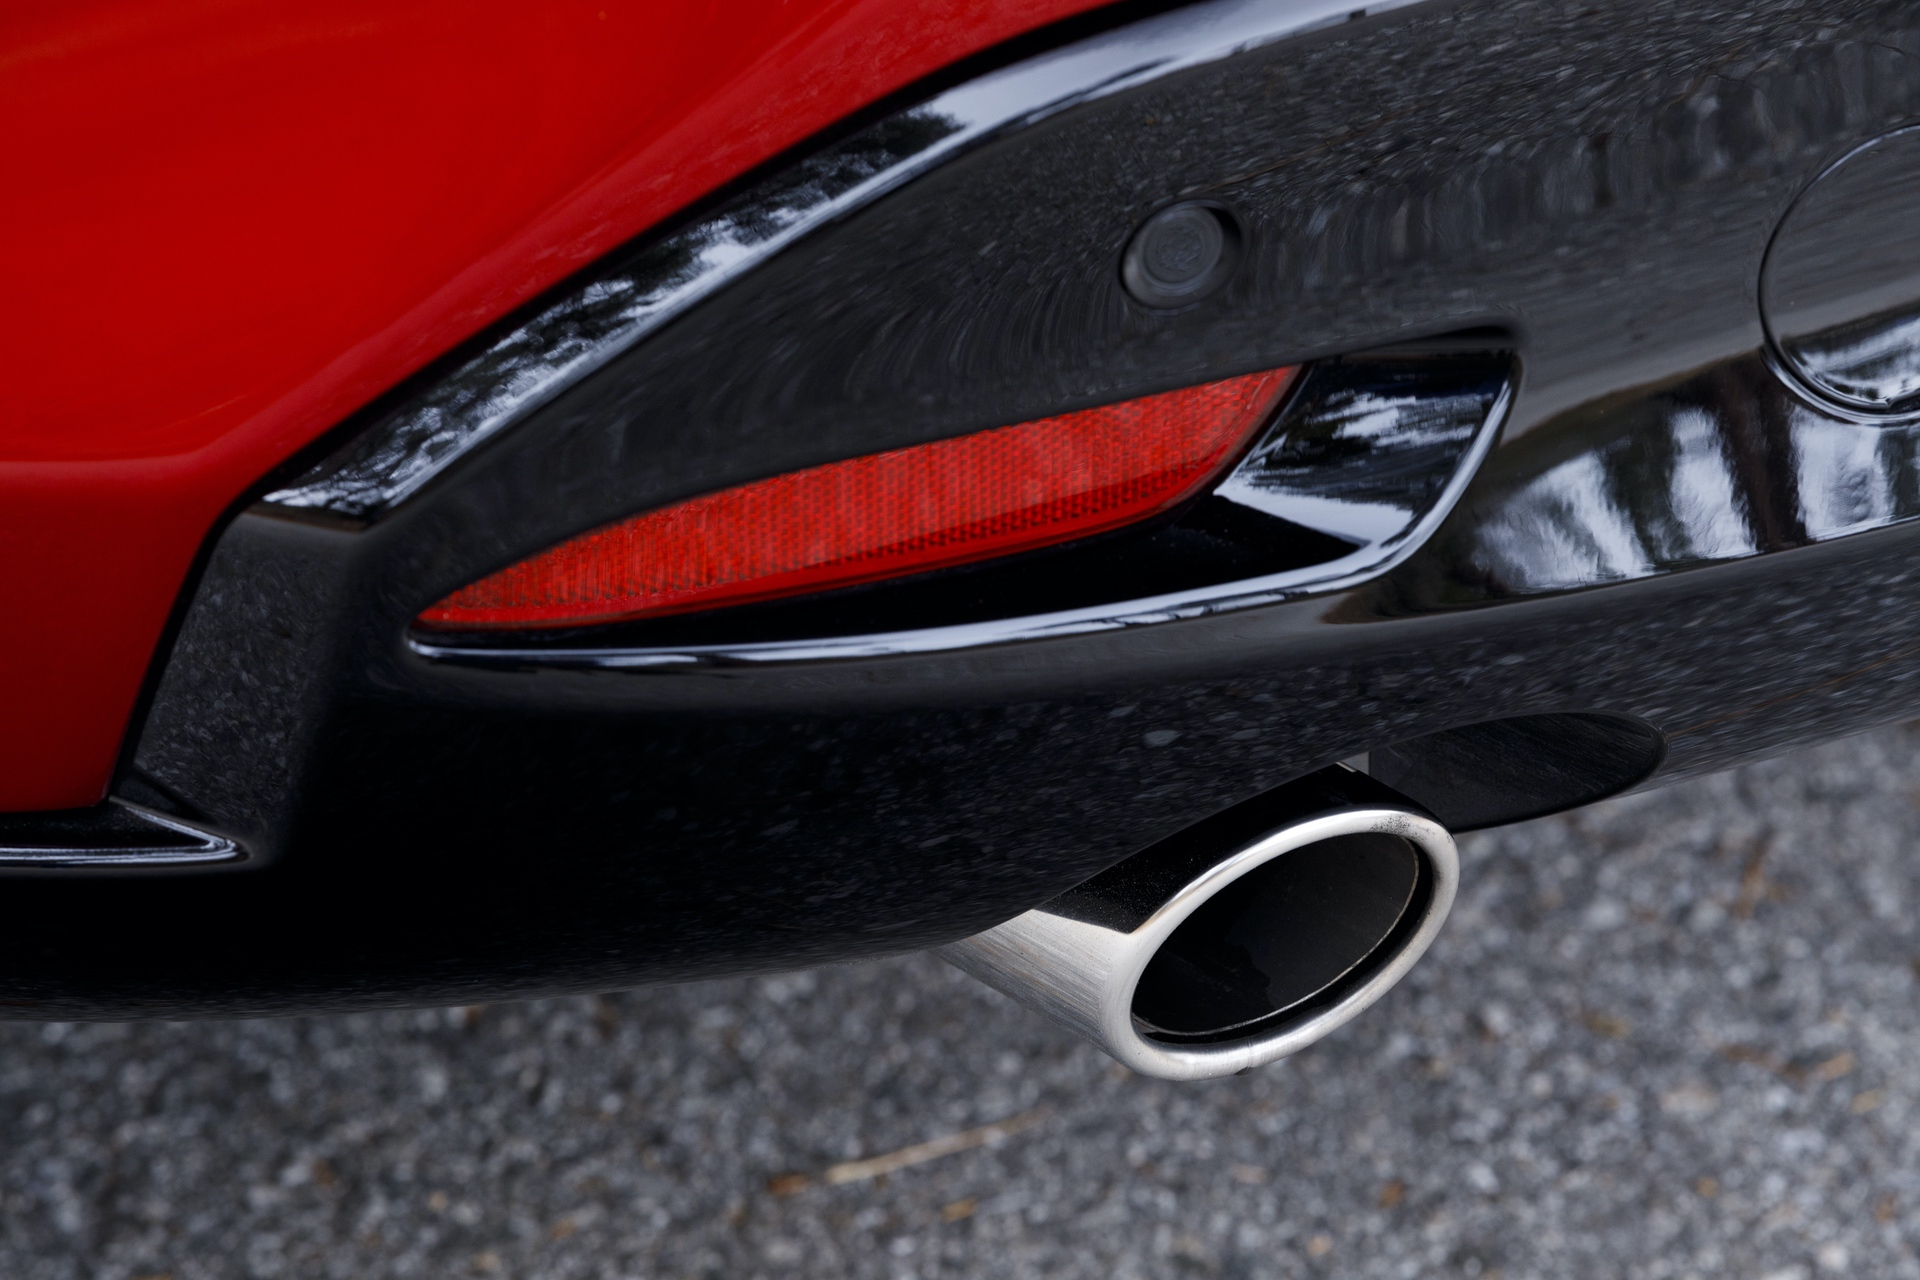 2019-Mazda3-Hatchback_23